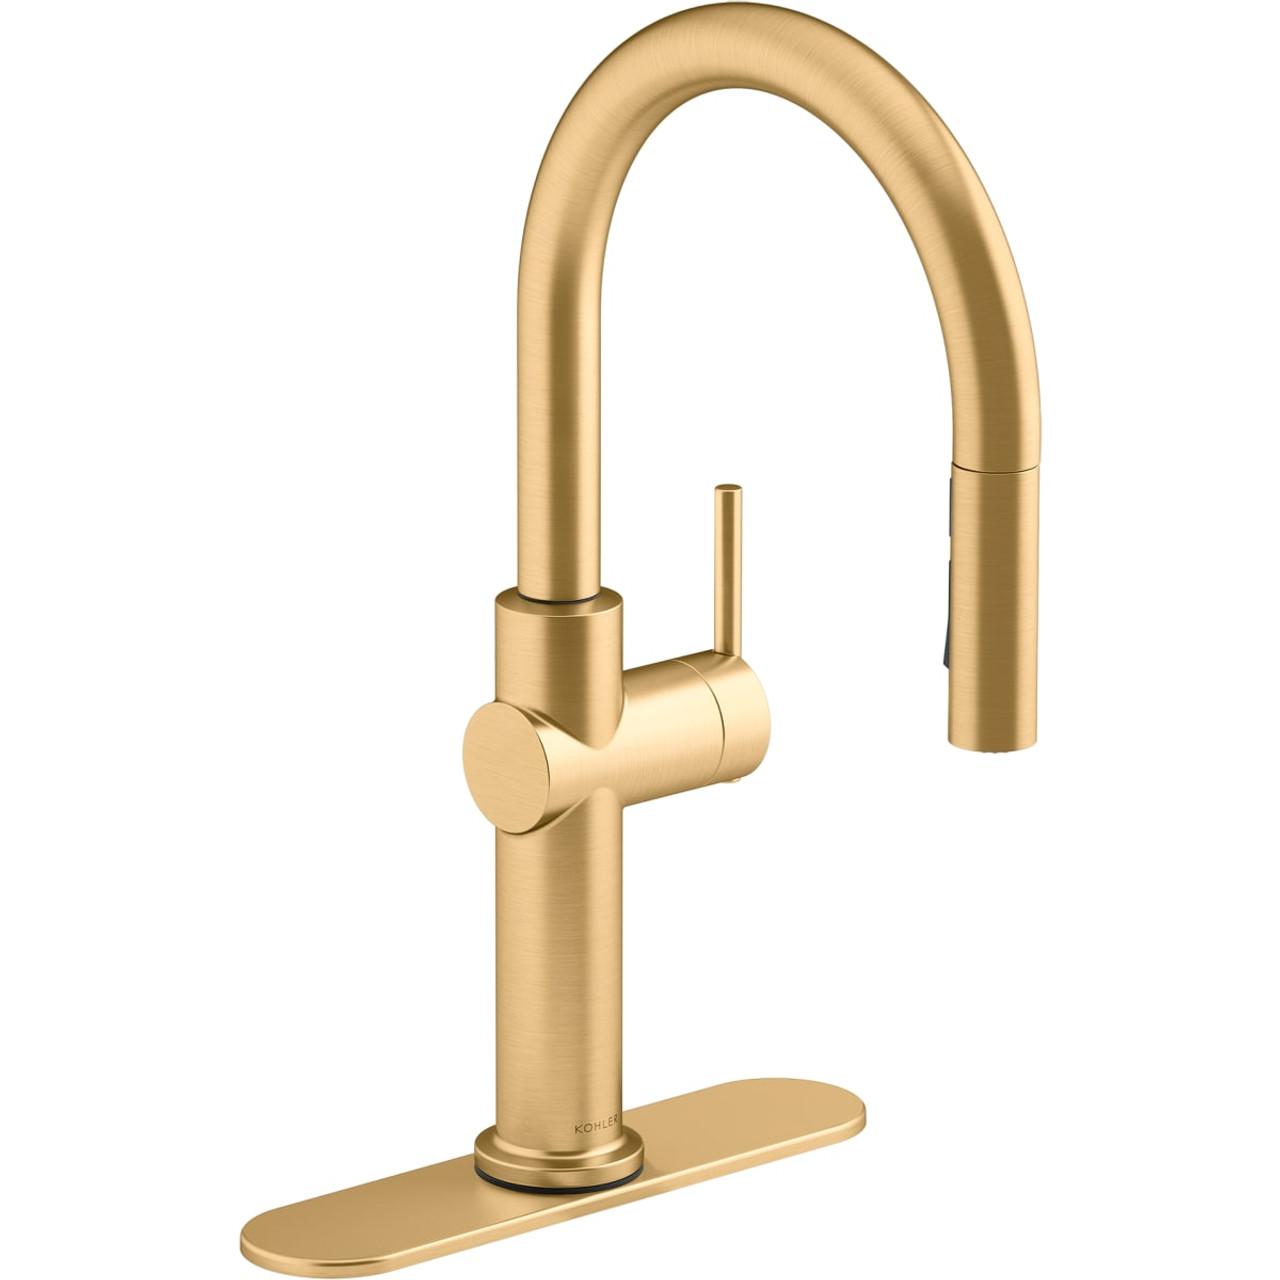 kohler crue 1 5 gpm single hole pull down kitchen faucet includes escutcheon